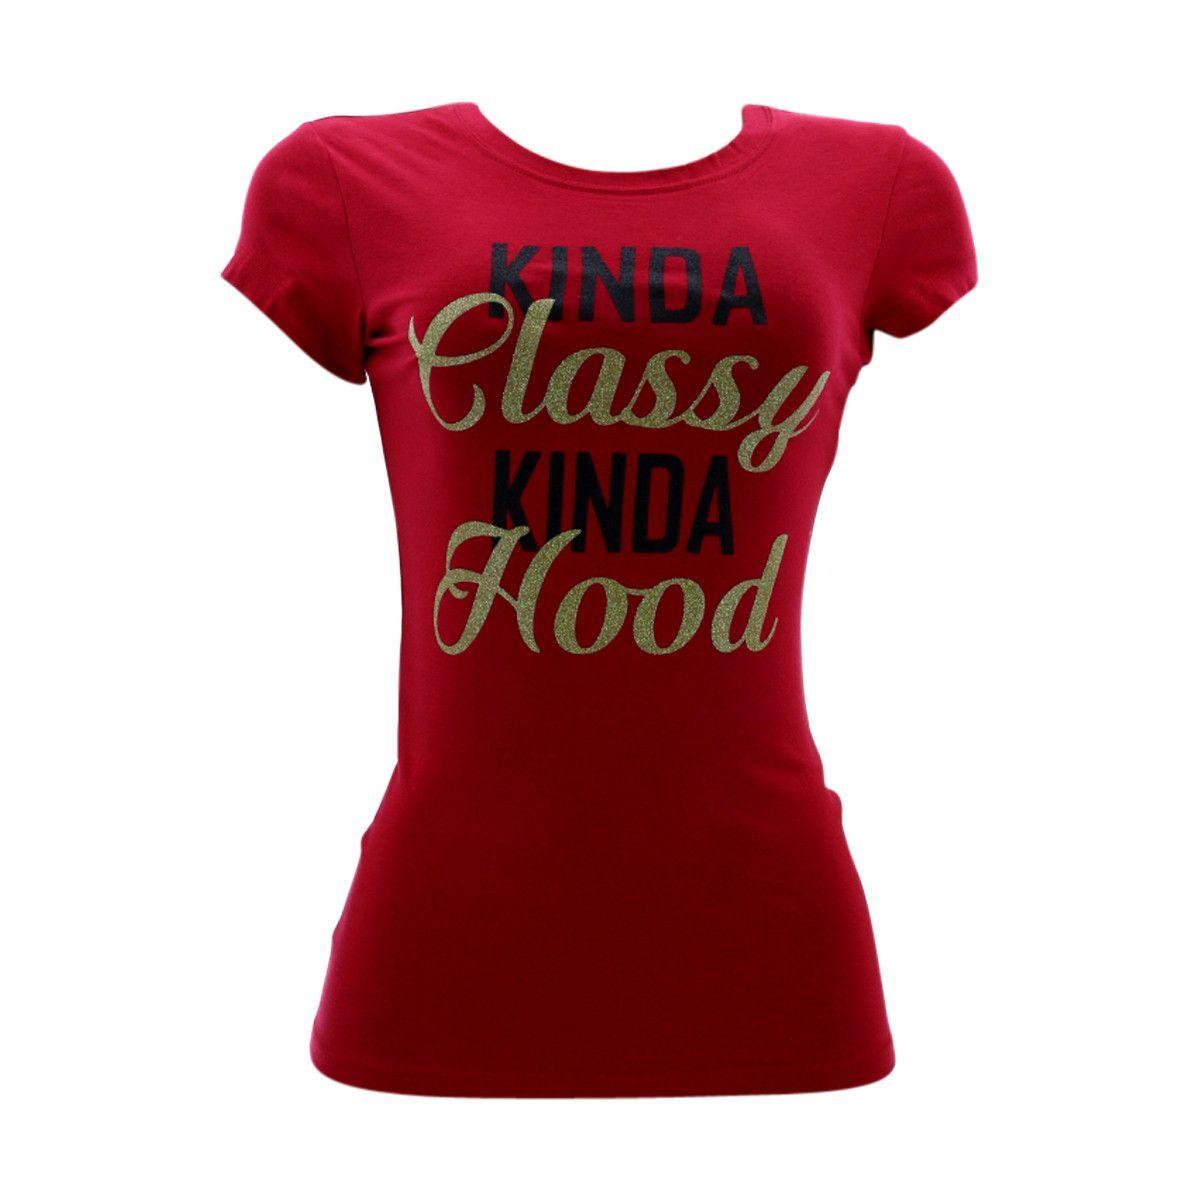 3 Forty - Women's Foil Kinda Classy Kinda Hood T-Shirt - Red/Gold